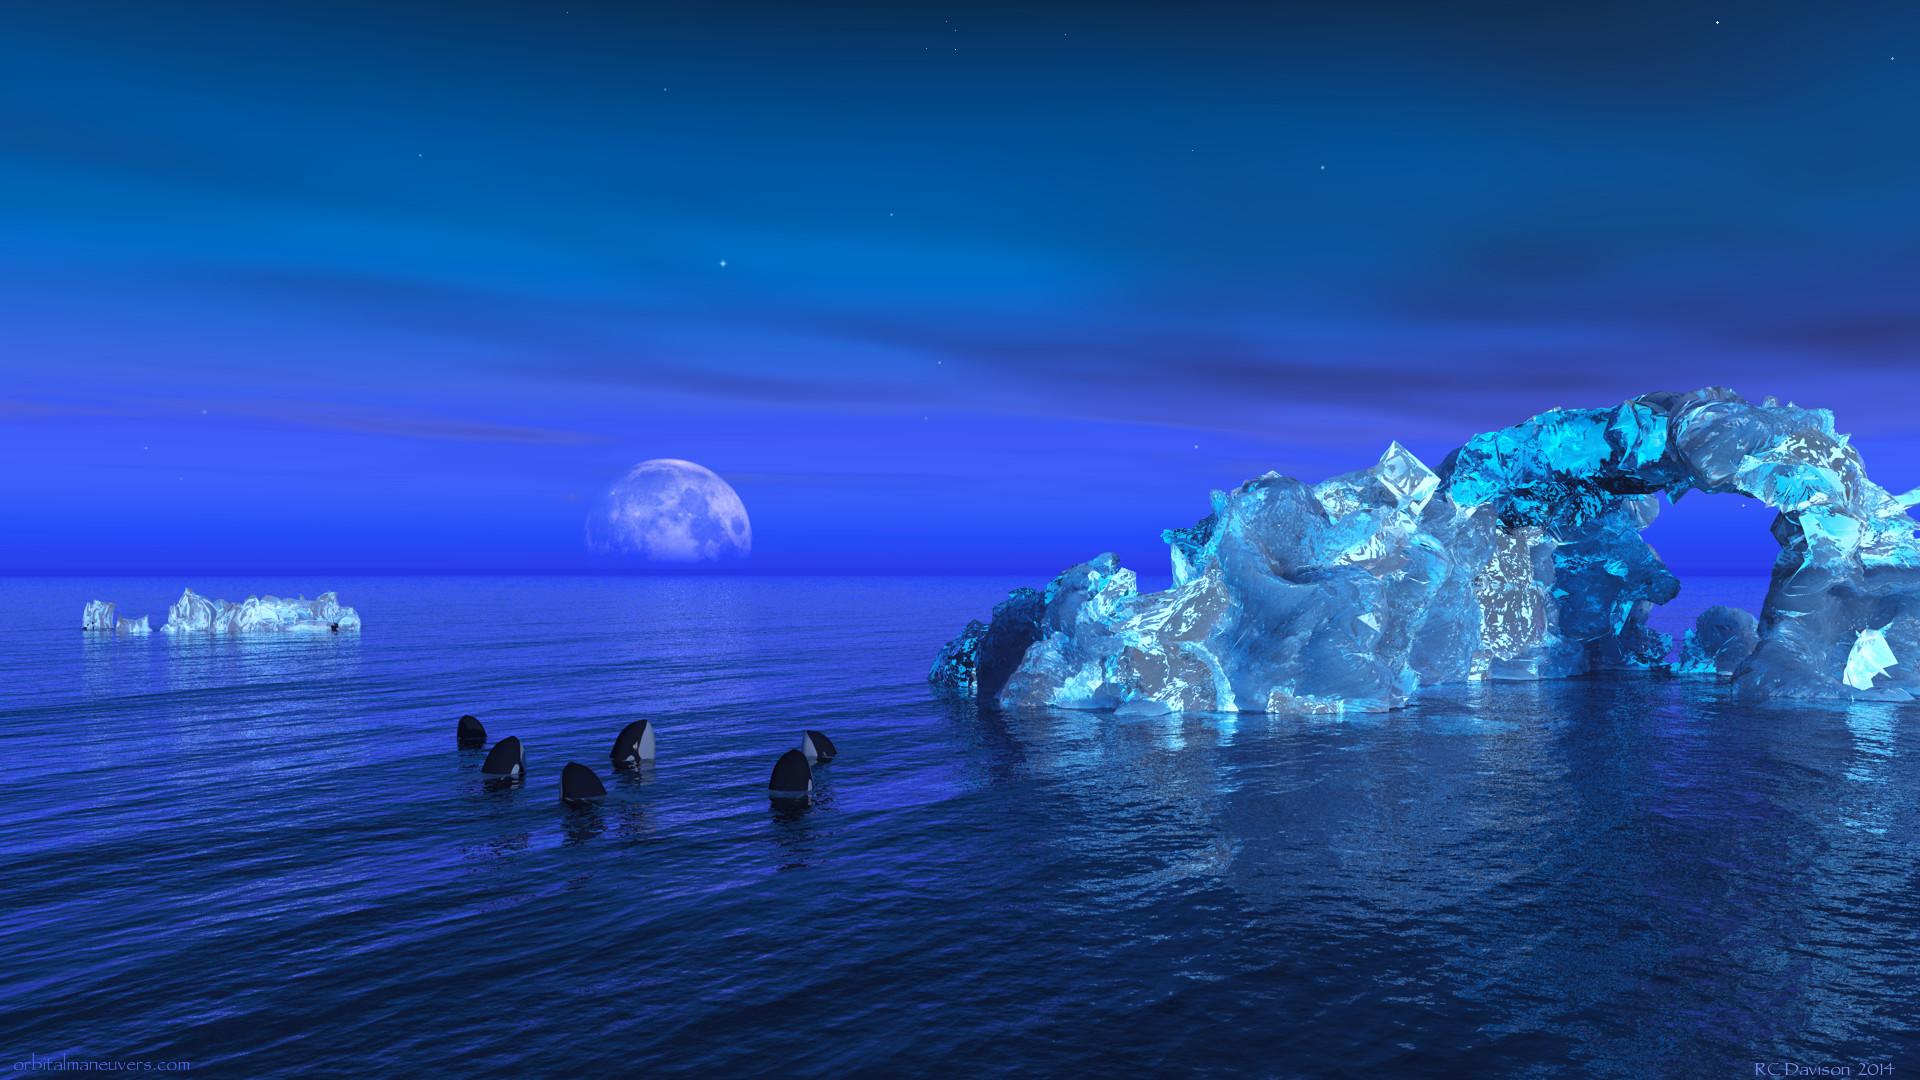 Orca wallpaper hd altavistaventures Image collections